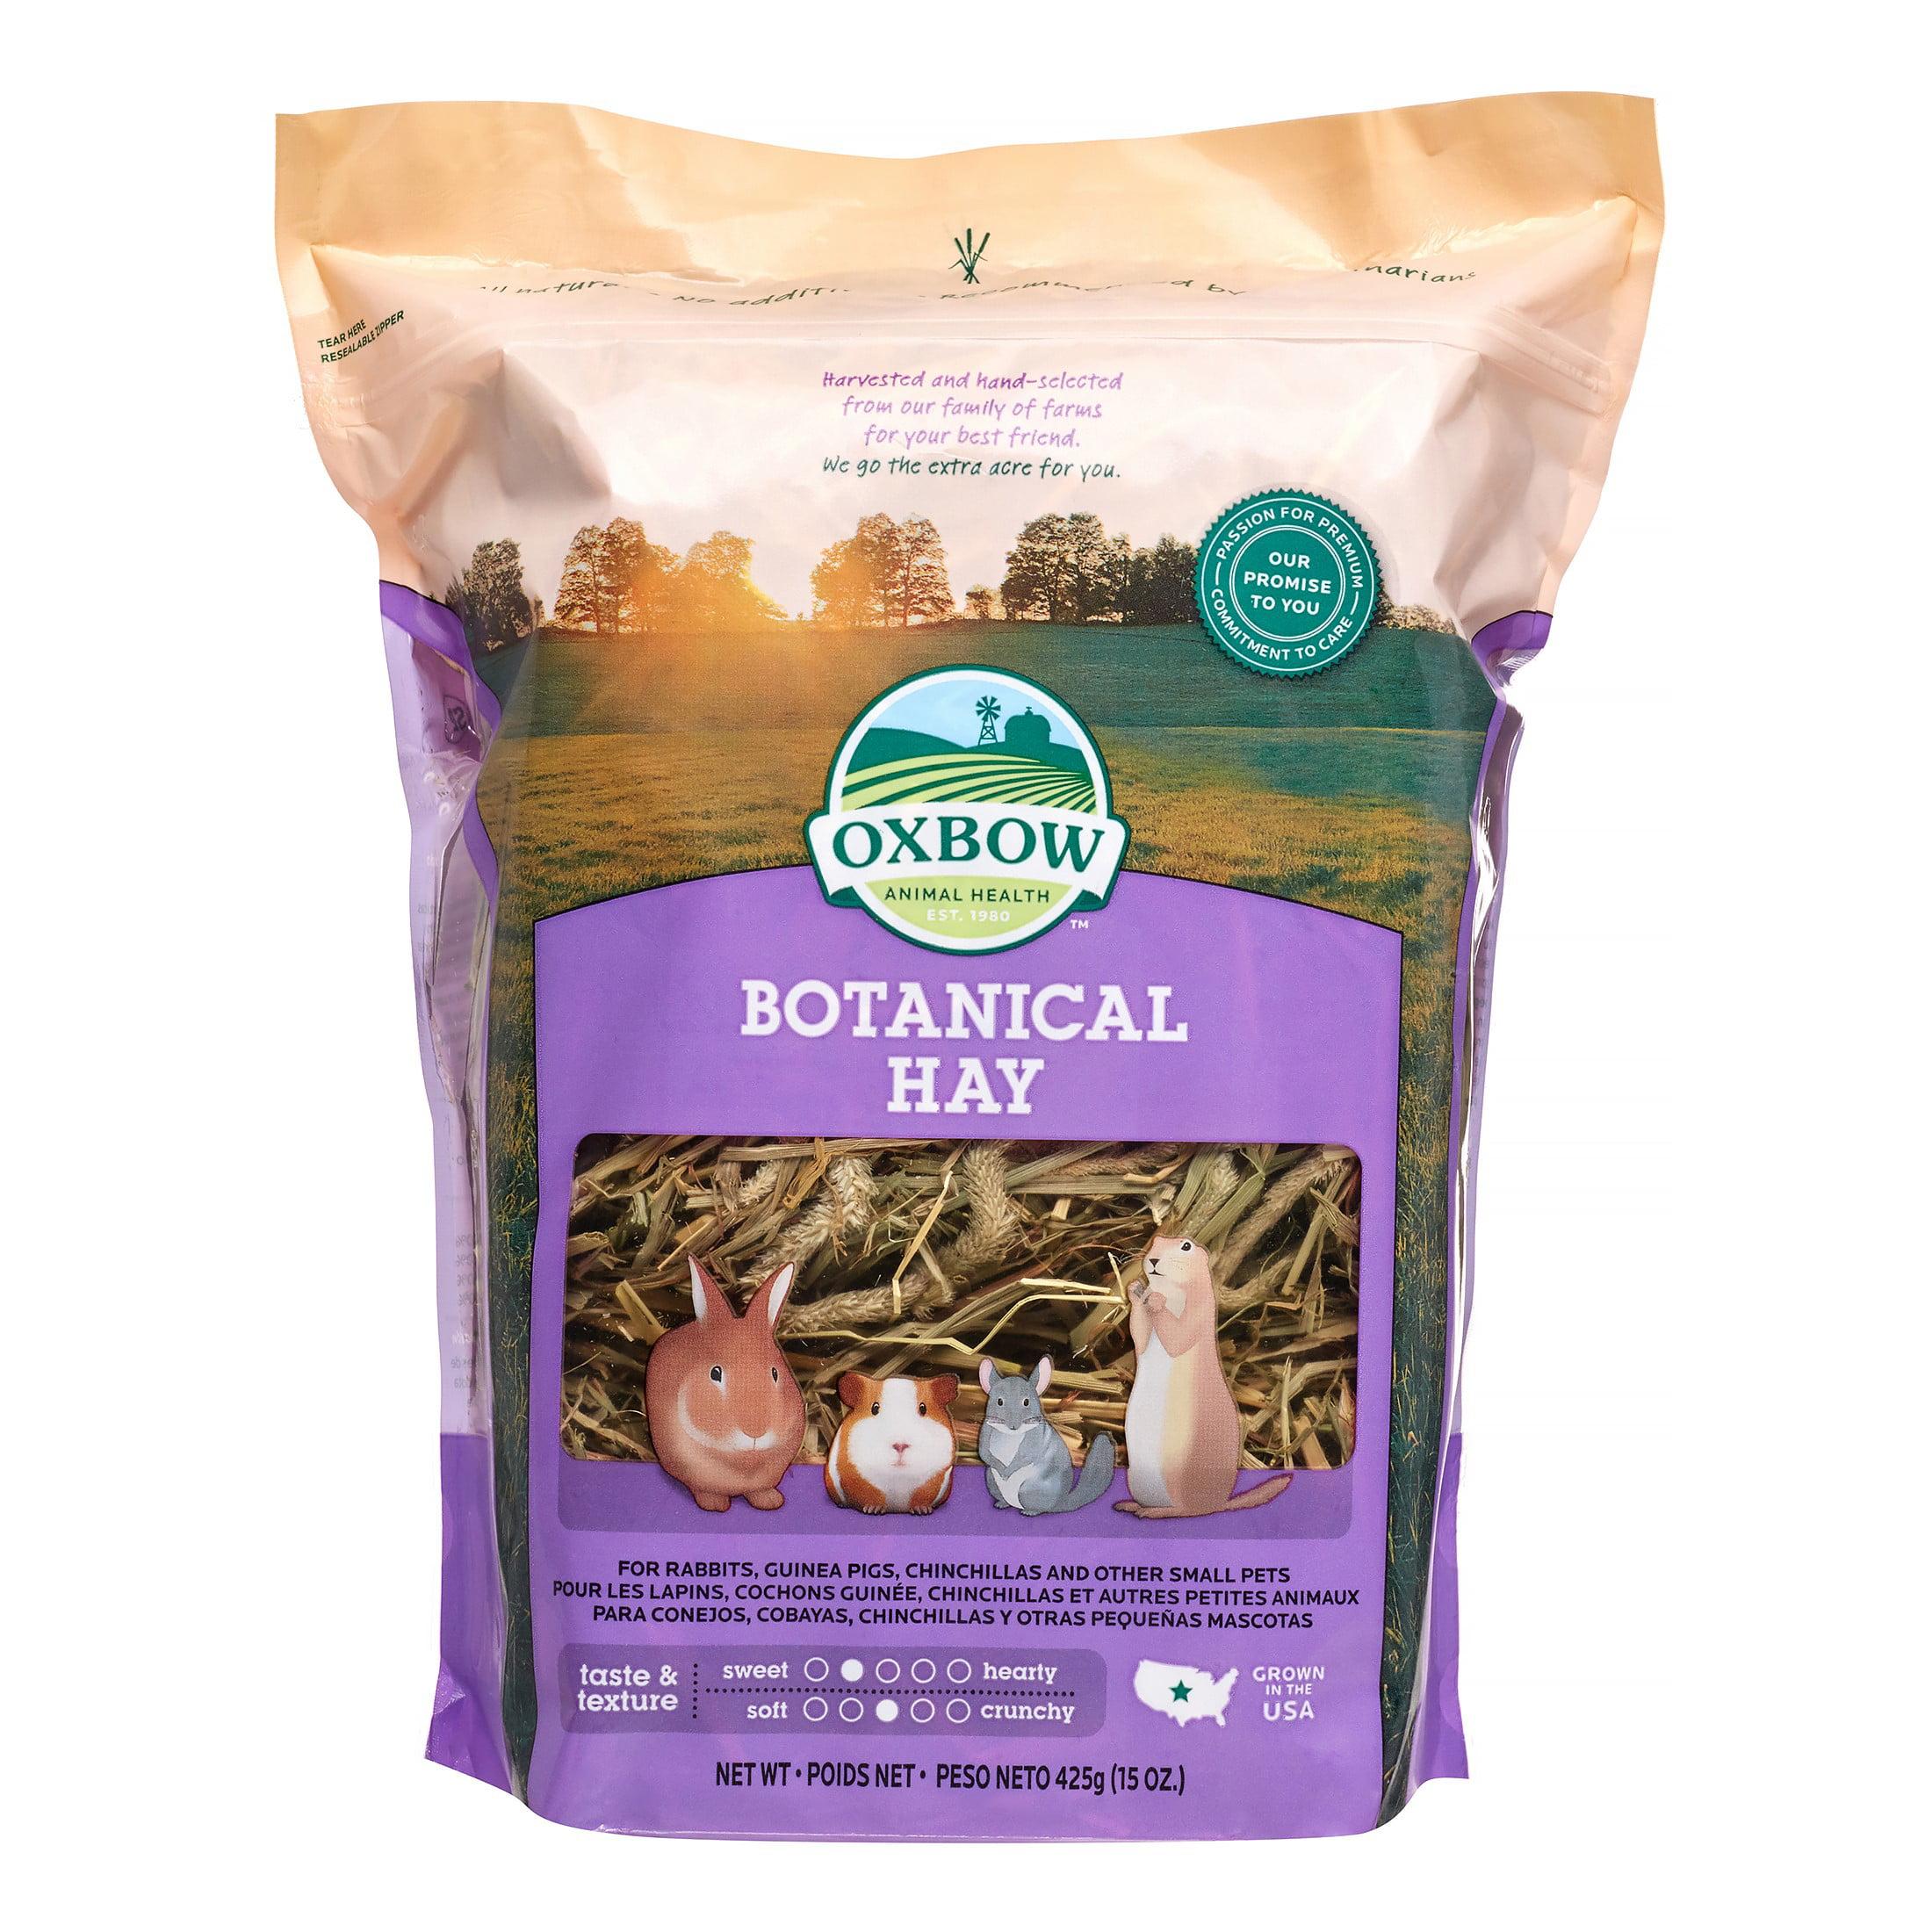 Oxbow Pet Products Botanical Hay Dry Small Animal Food, 15 oz.